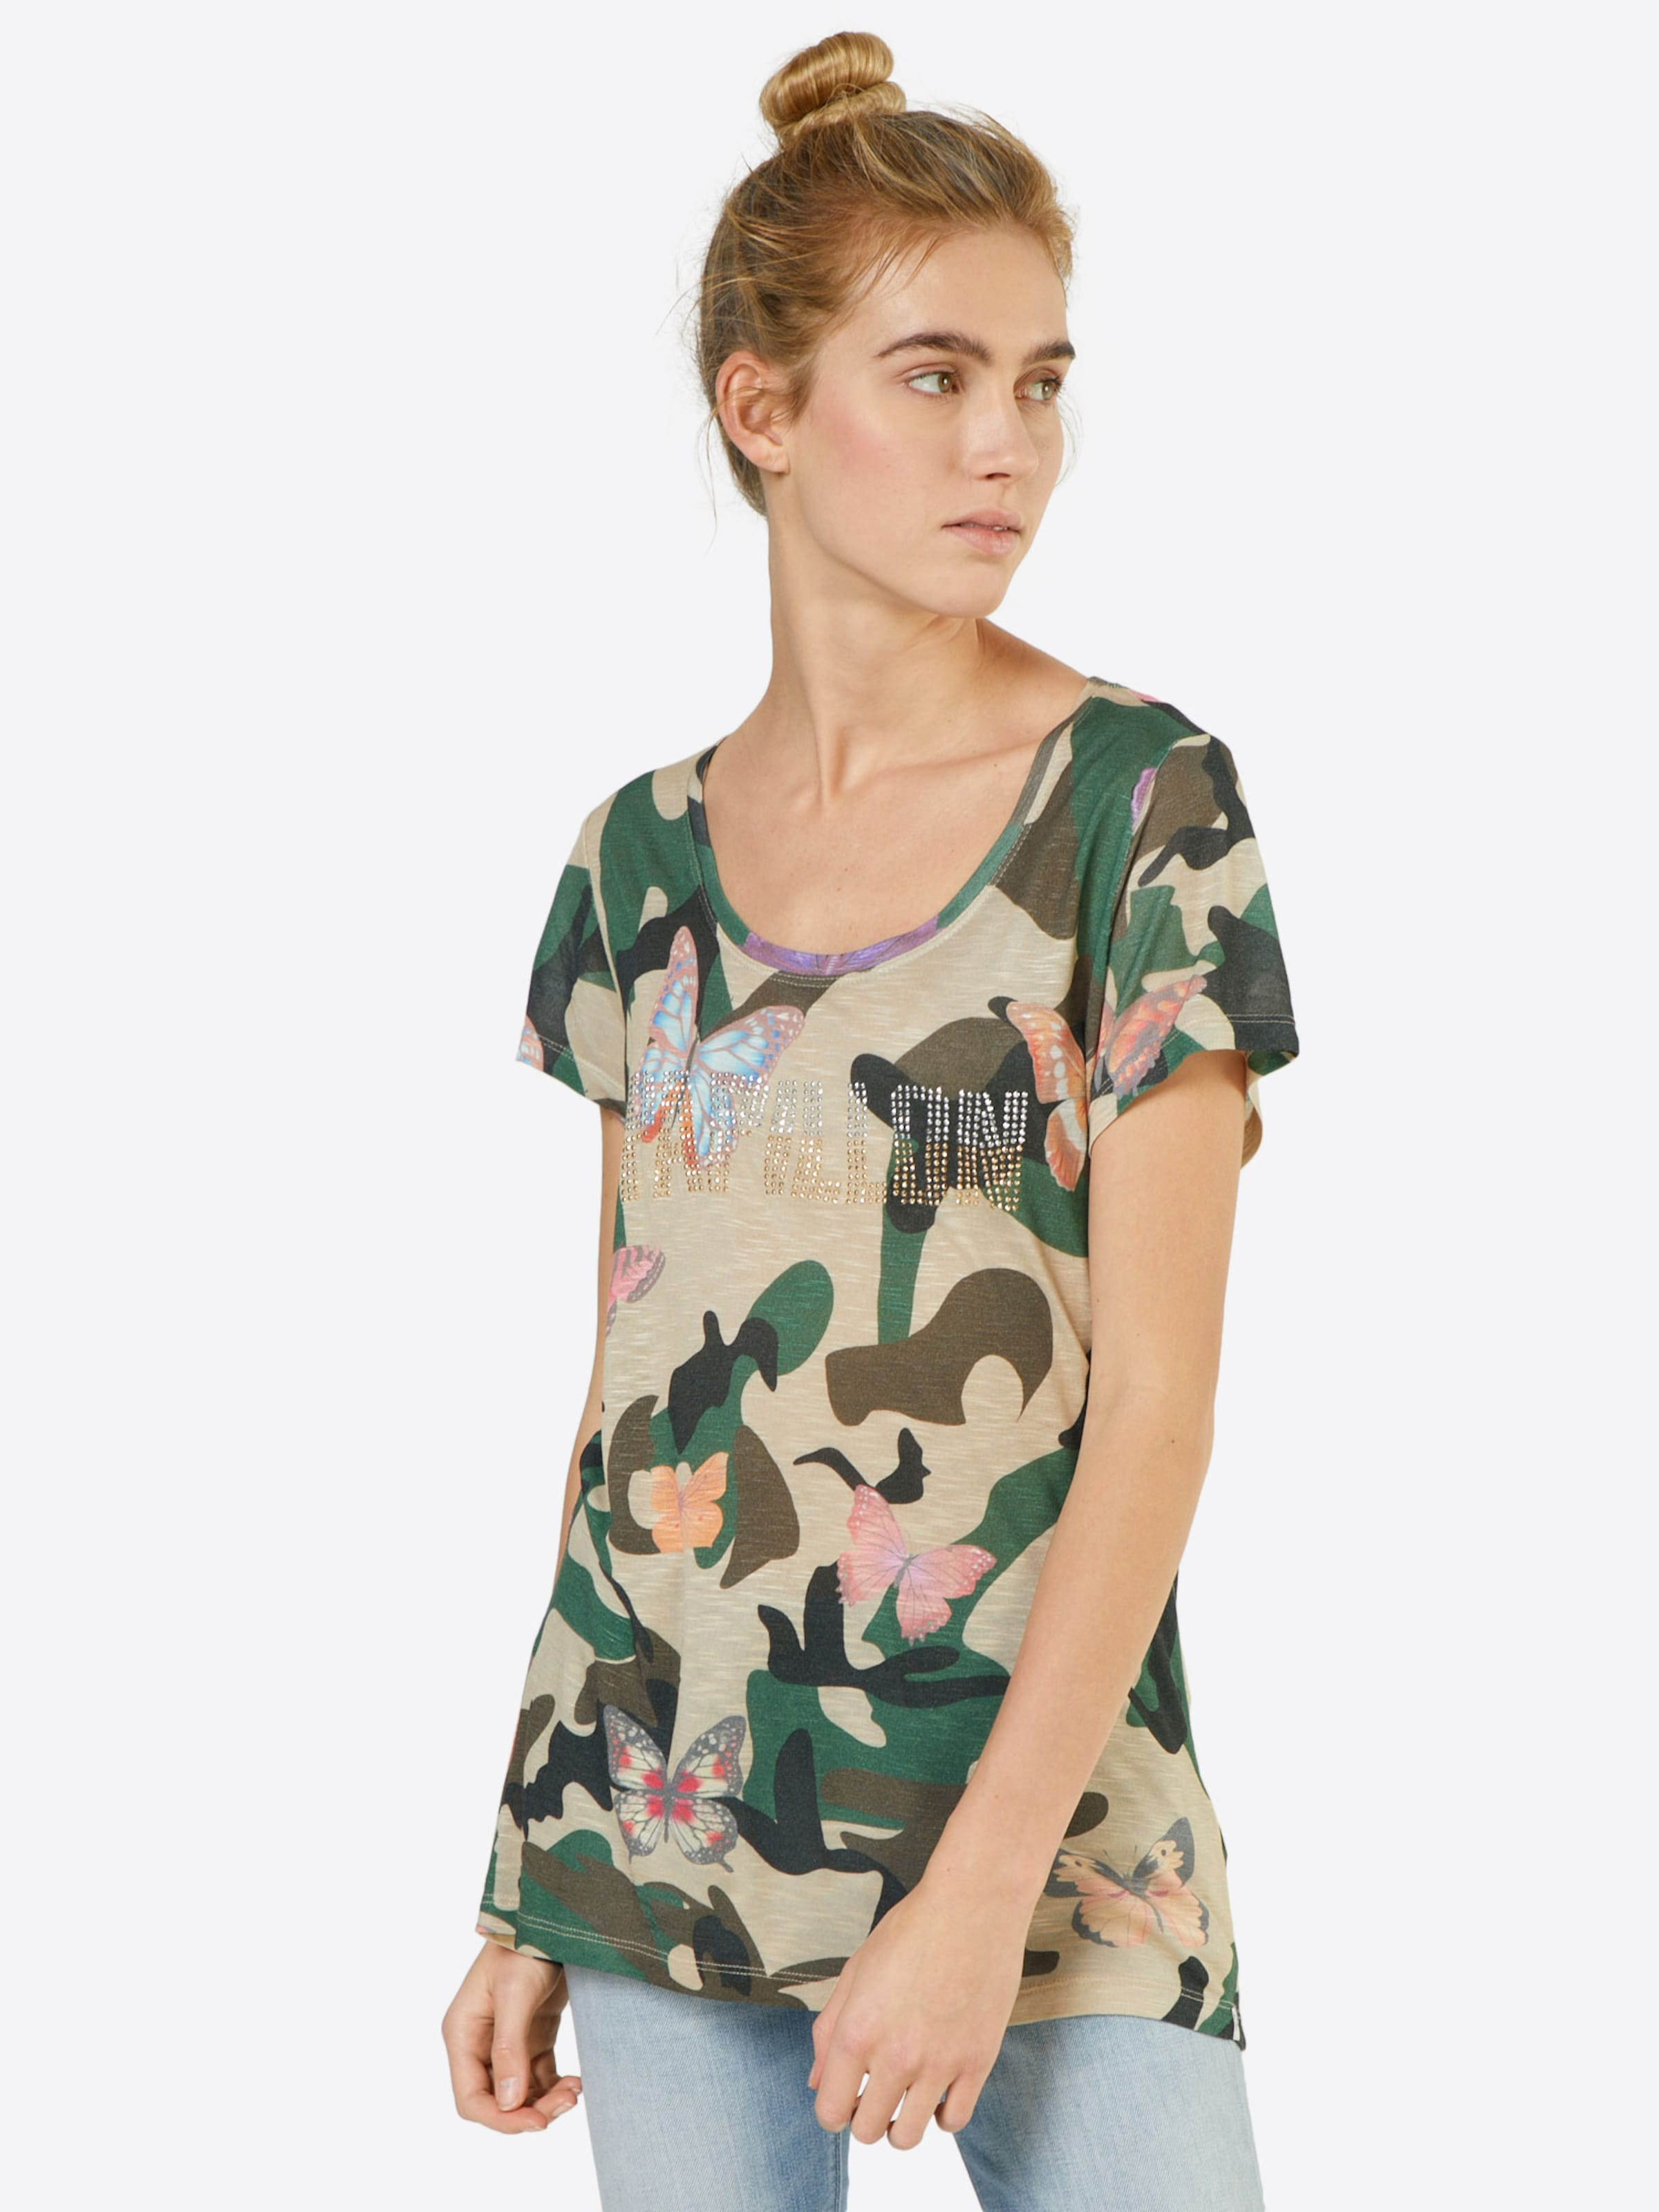 Freies Verschiffen Bester Platz Key Largo langes Shirt Rabatt-Shop Rabatt 100% Original Speicher Mit Großem Rabatt 0A7GcYj2